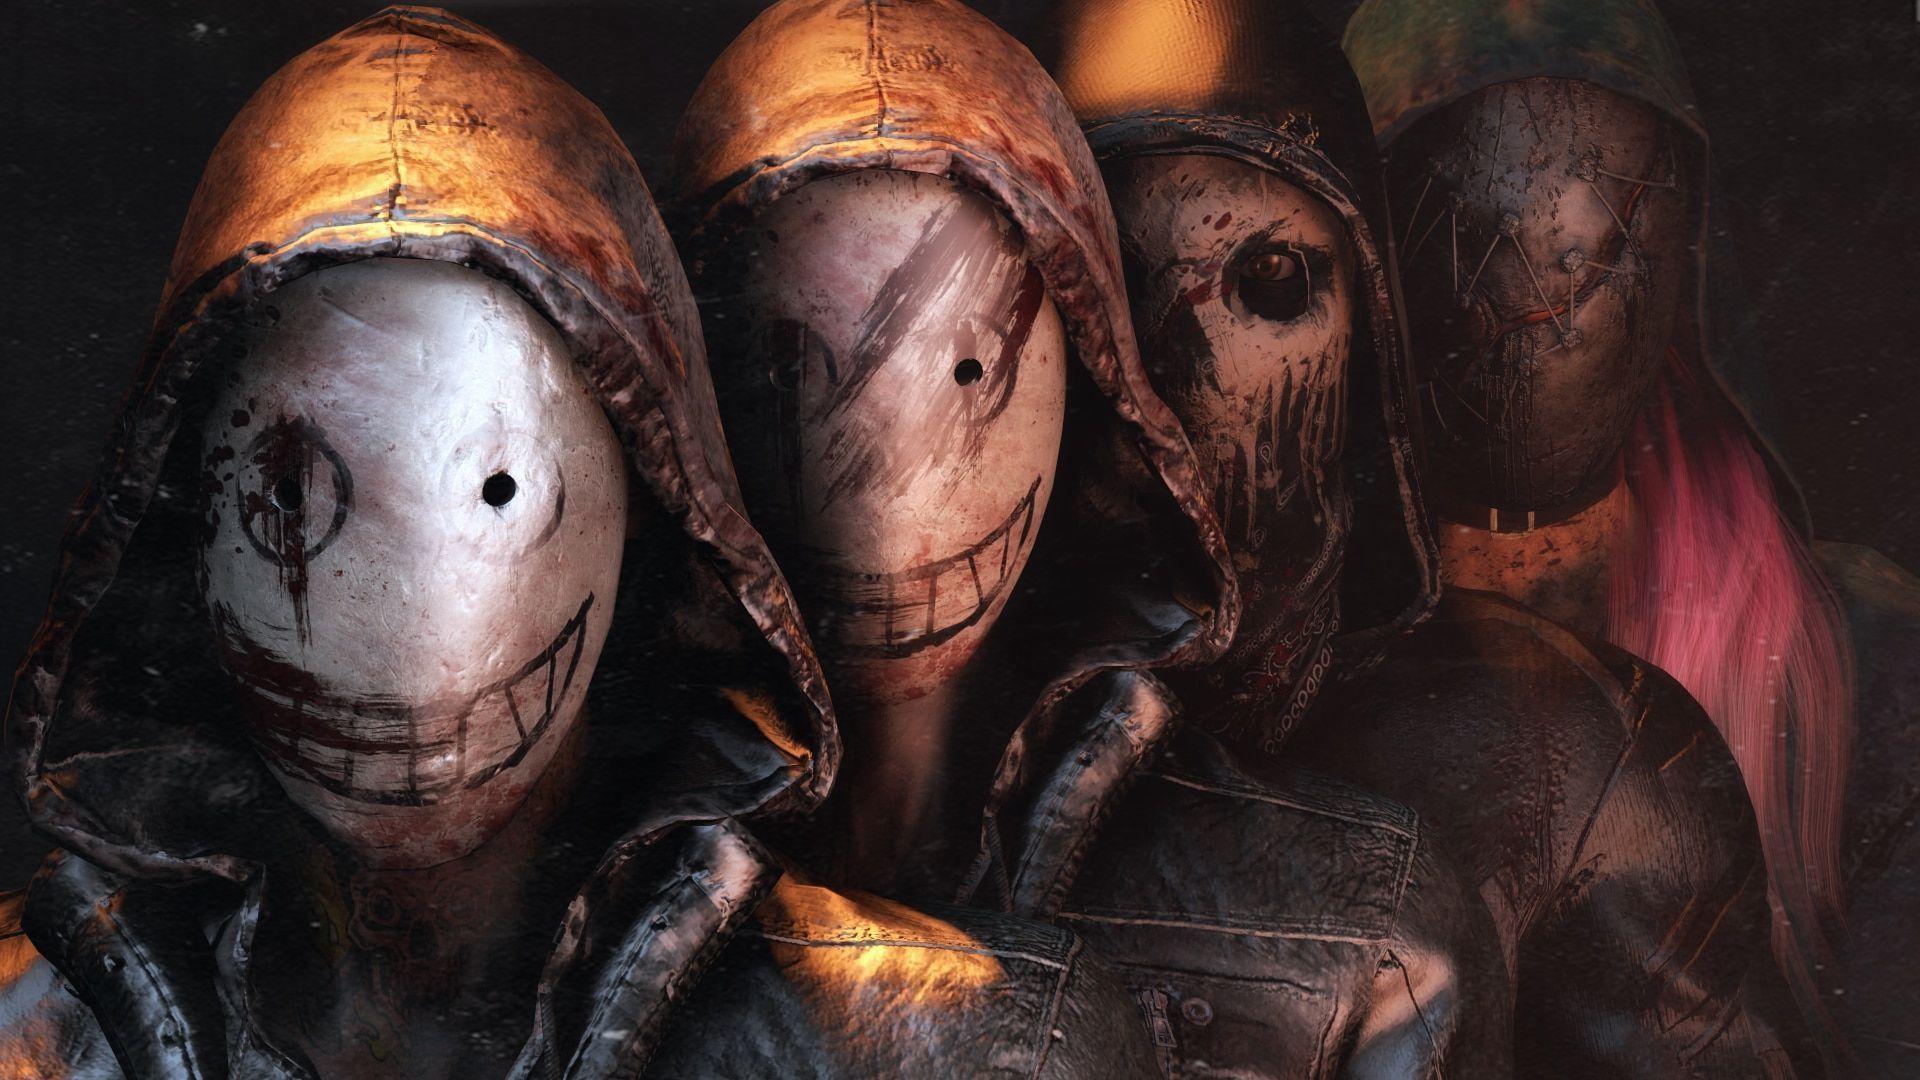 Dead By Daylight Legion Wallpapers - Wallpaper Cave